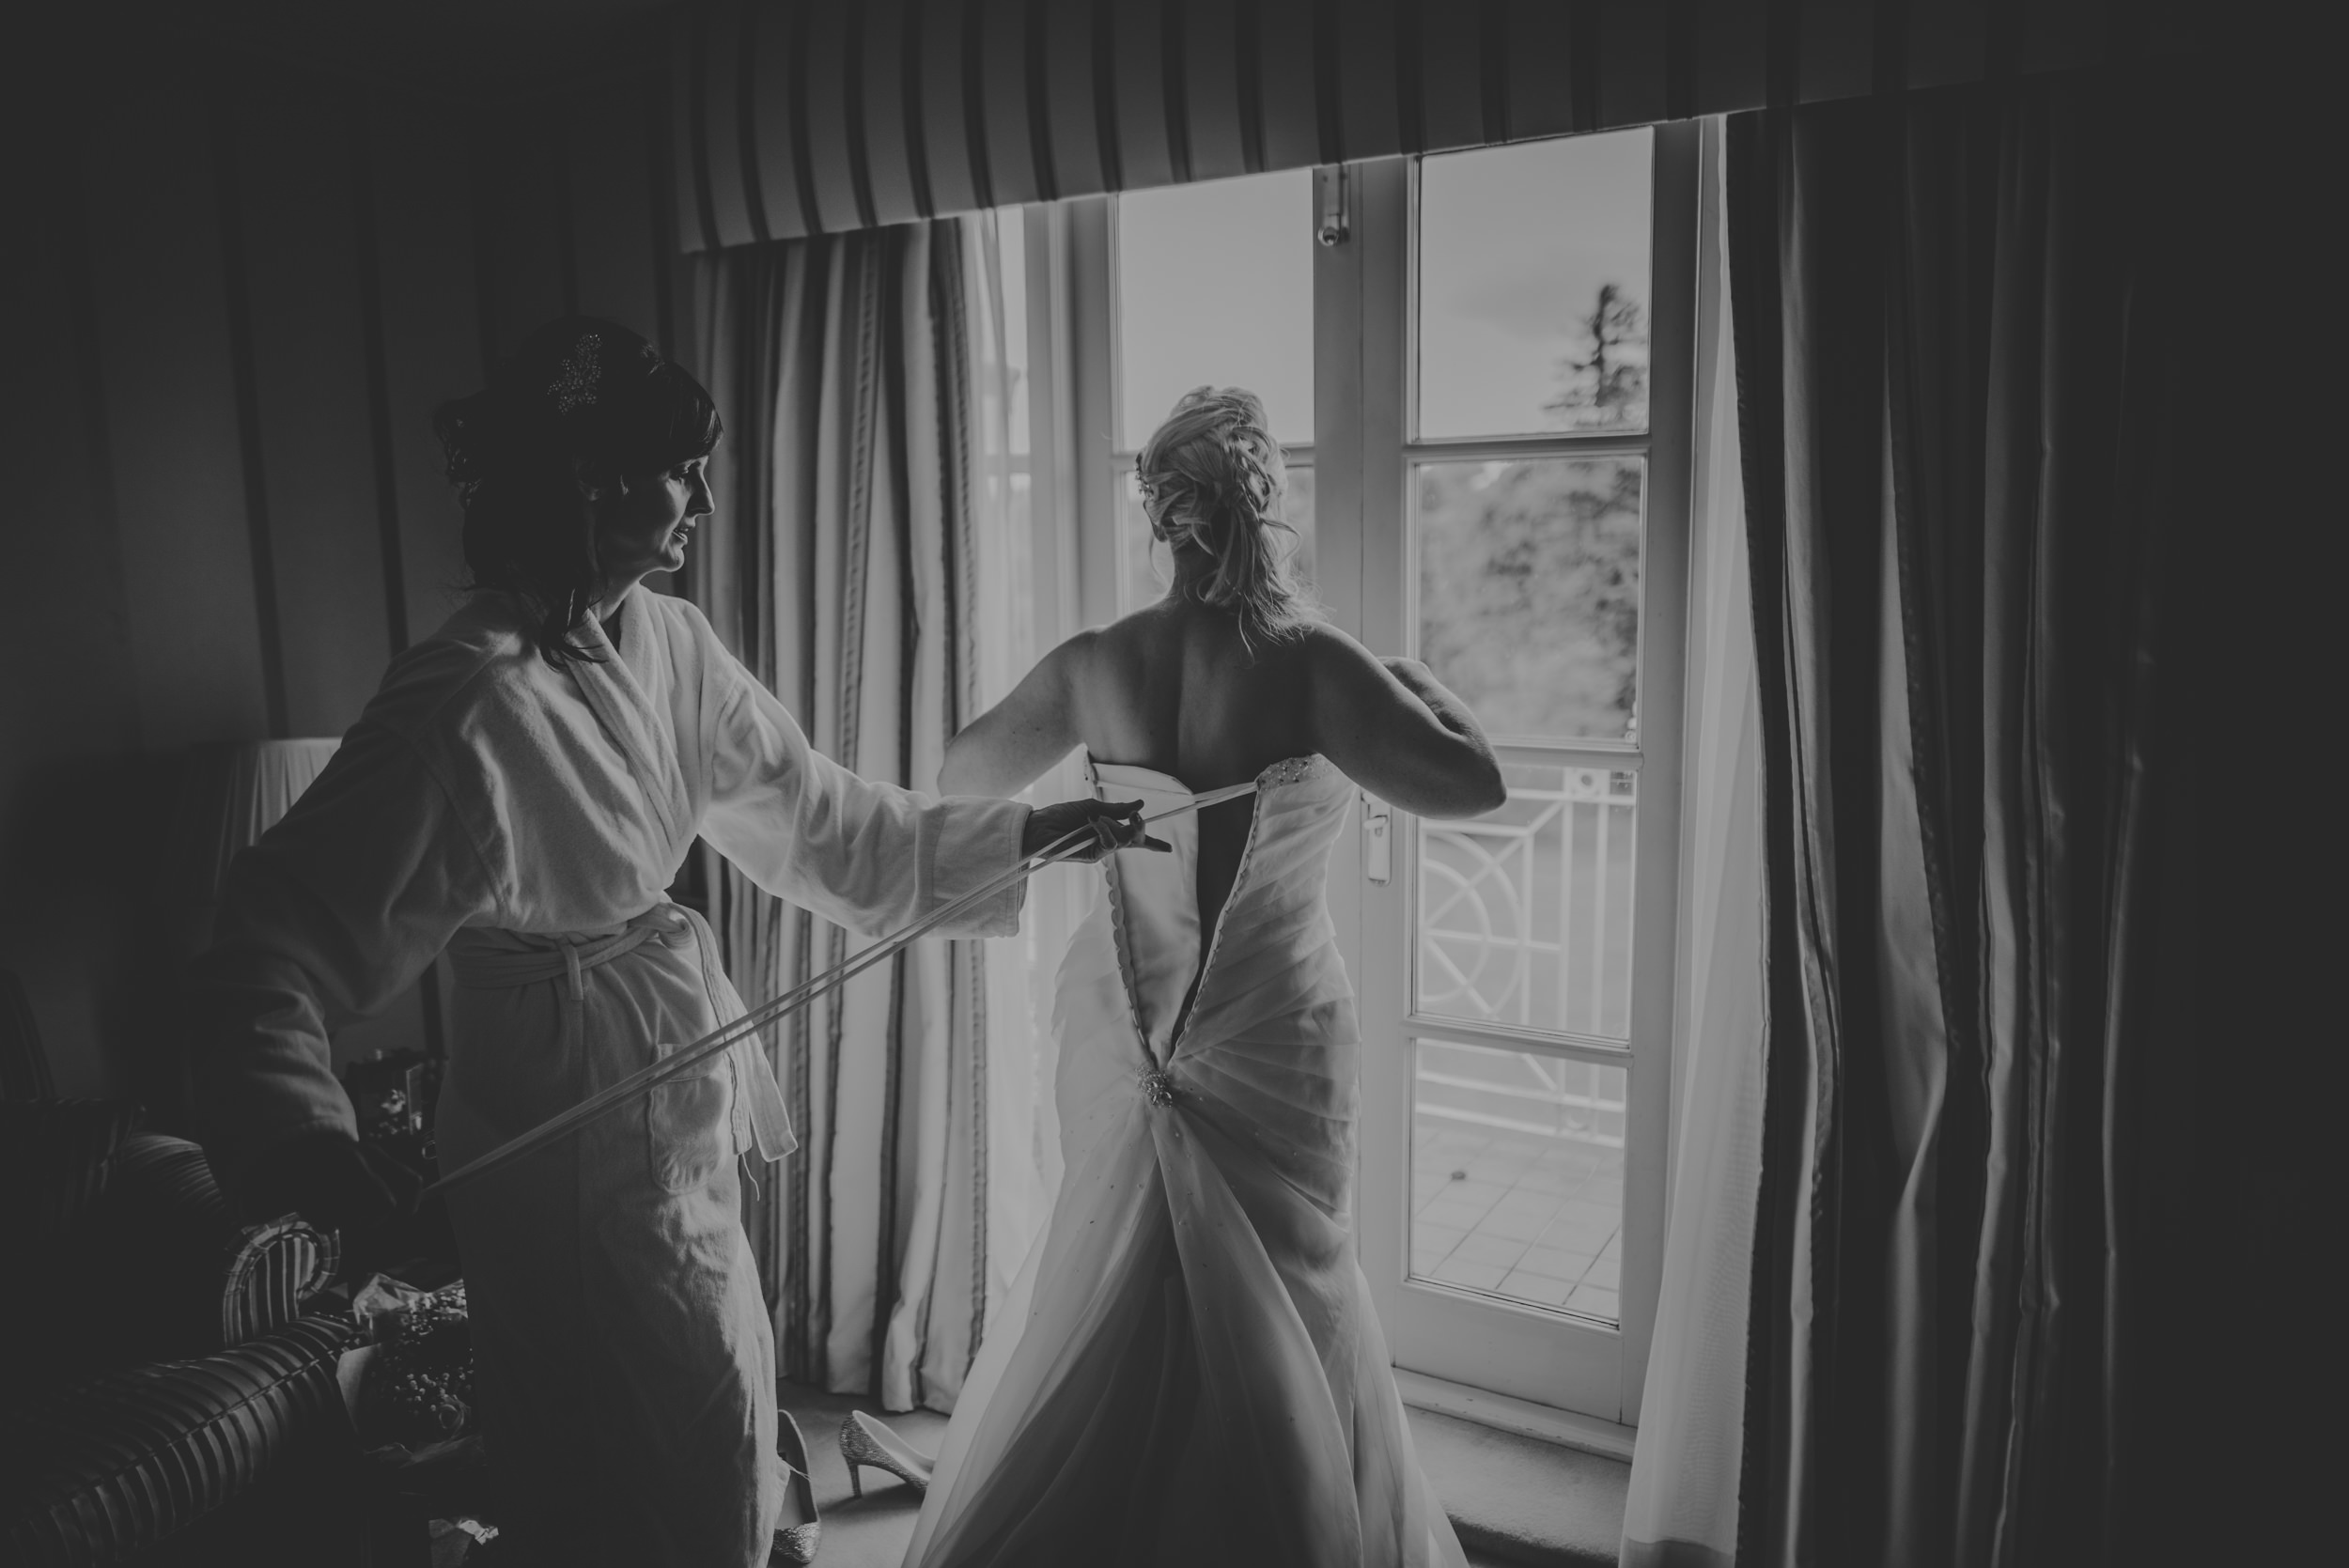 Trisha-and-Roger-wedding-The-Priory-Church-and-Chewton-Glen-Hotel-Christchurch-Manu-Mendoza-Wedding-Photography-039.jpg